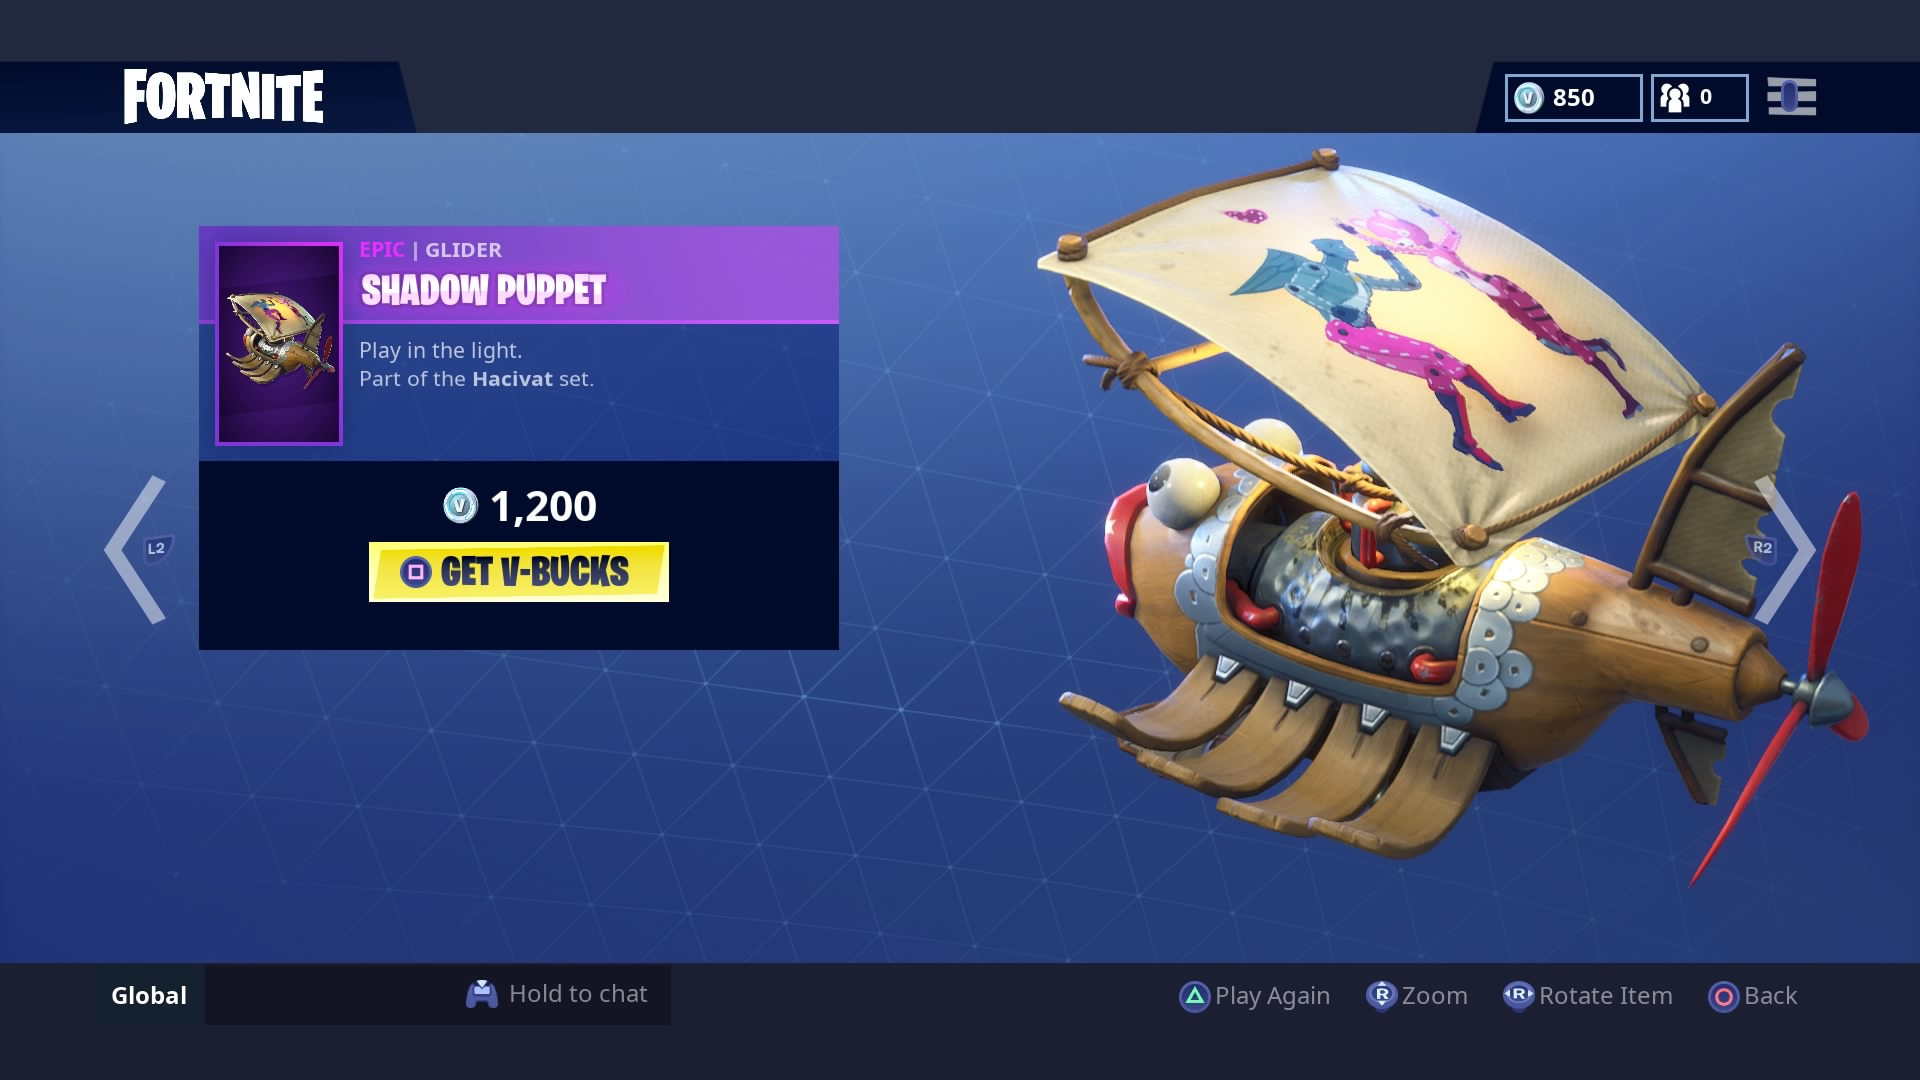 fortnite shadow puppet glider wallpaper 65220